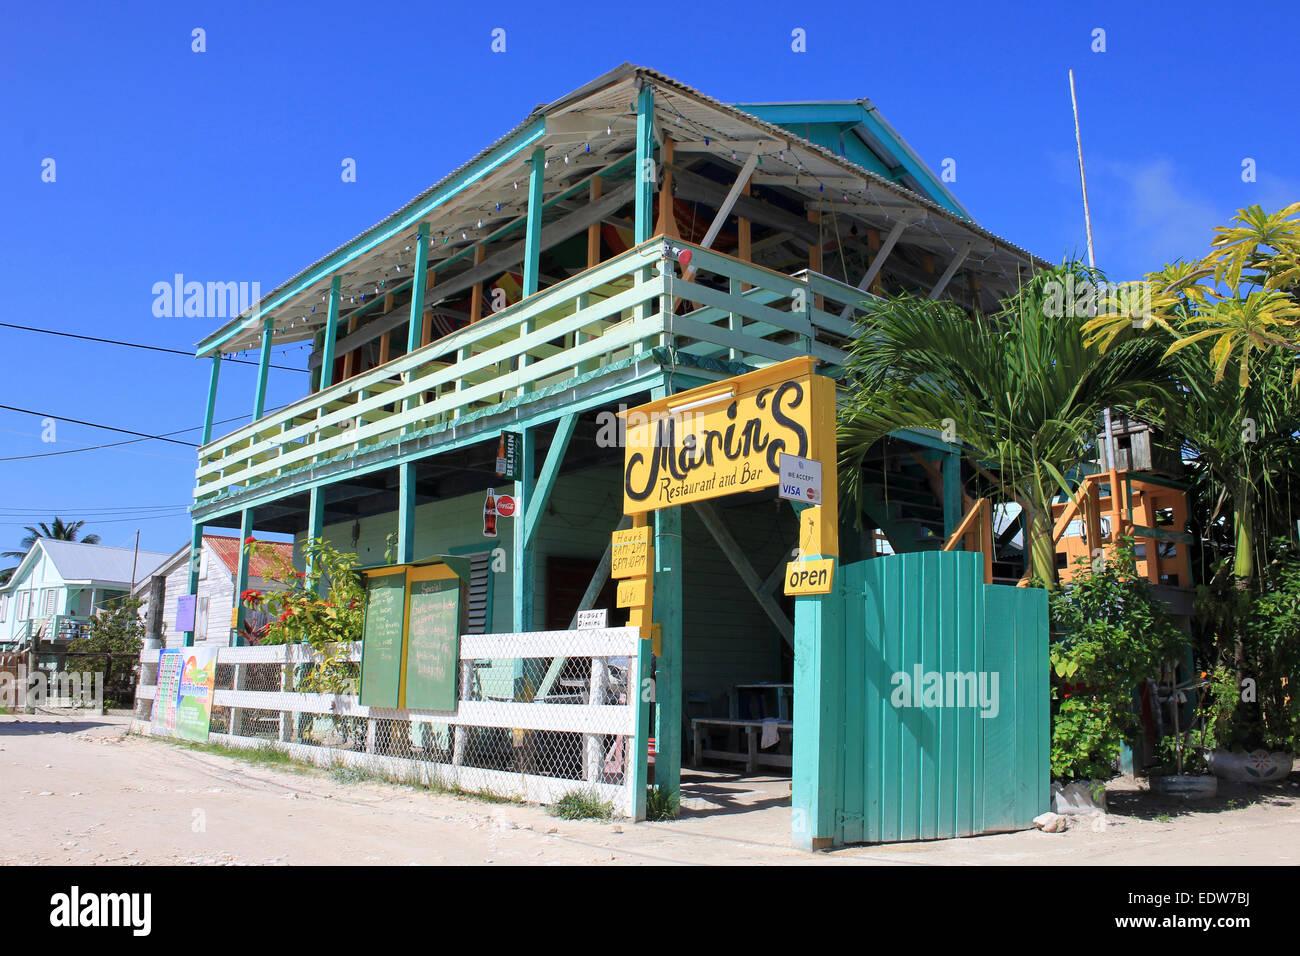 Marins Restaurant And Bar On On Caye Caulker Belize Stock Photo